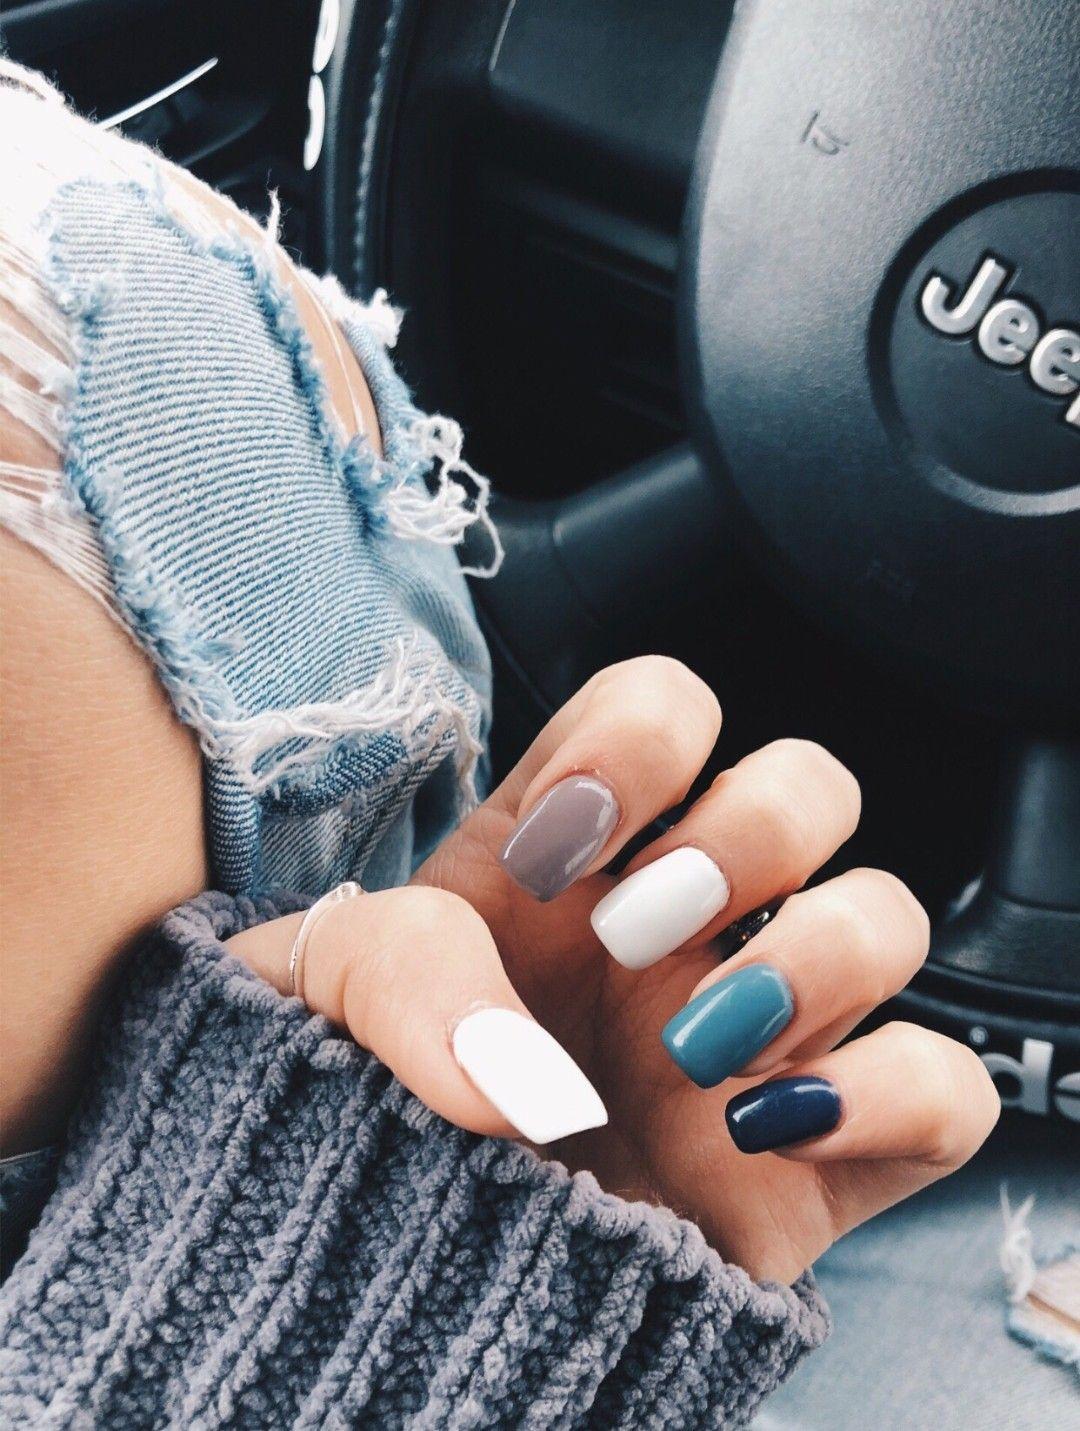 Strangertumblr Nails Acrylic Colorful Cute Vibes Vsco Instagram Aesthetic Tumblr Style Fashio Pretty Acrylic Nails Cute Acrylic Nails Nail Designs